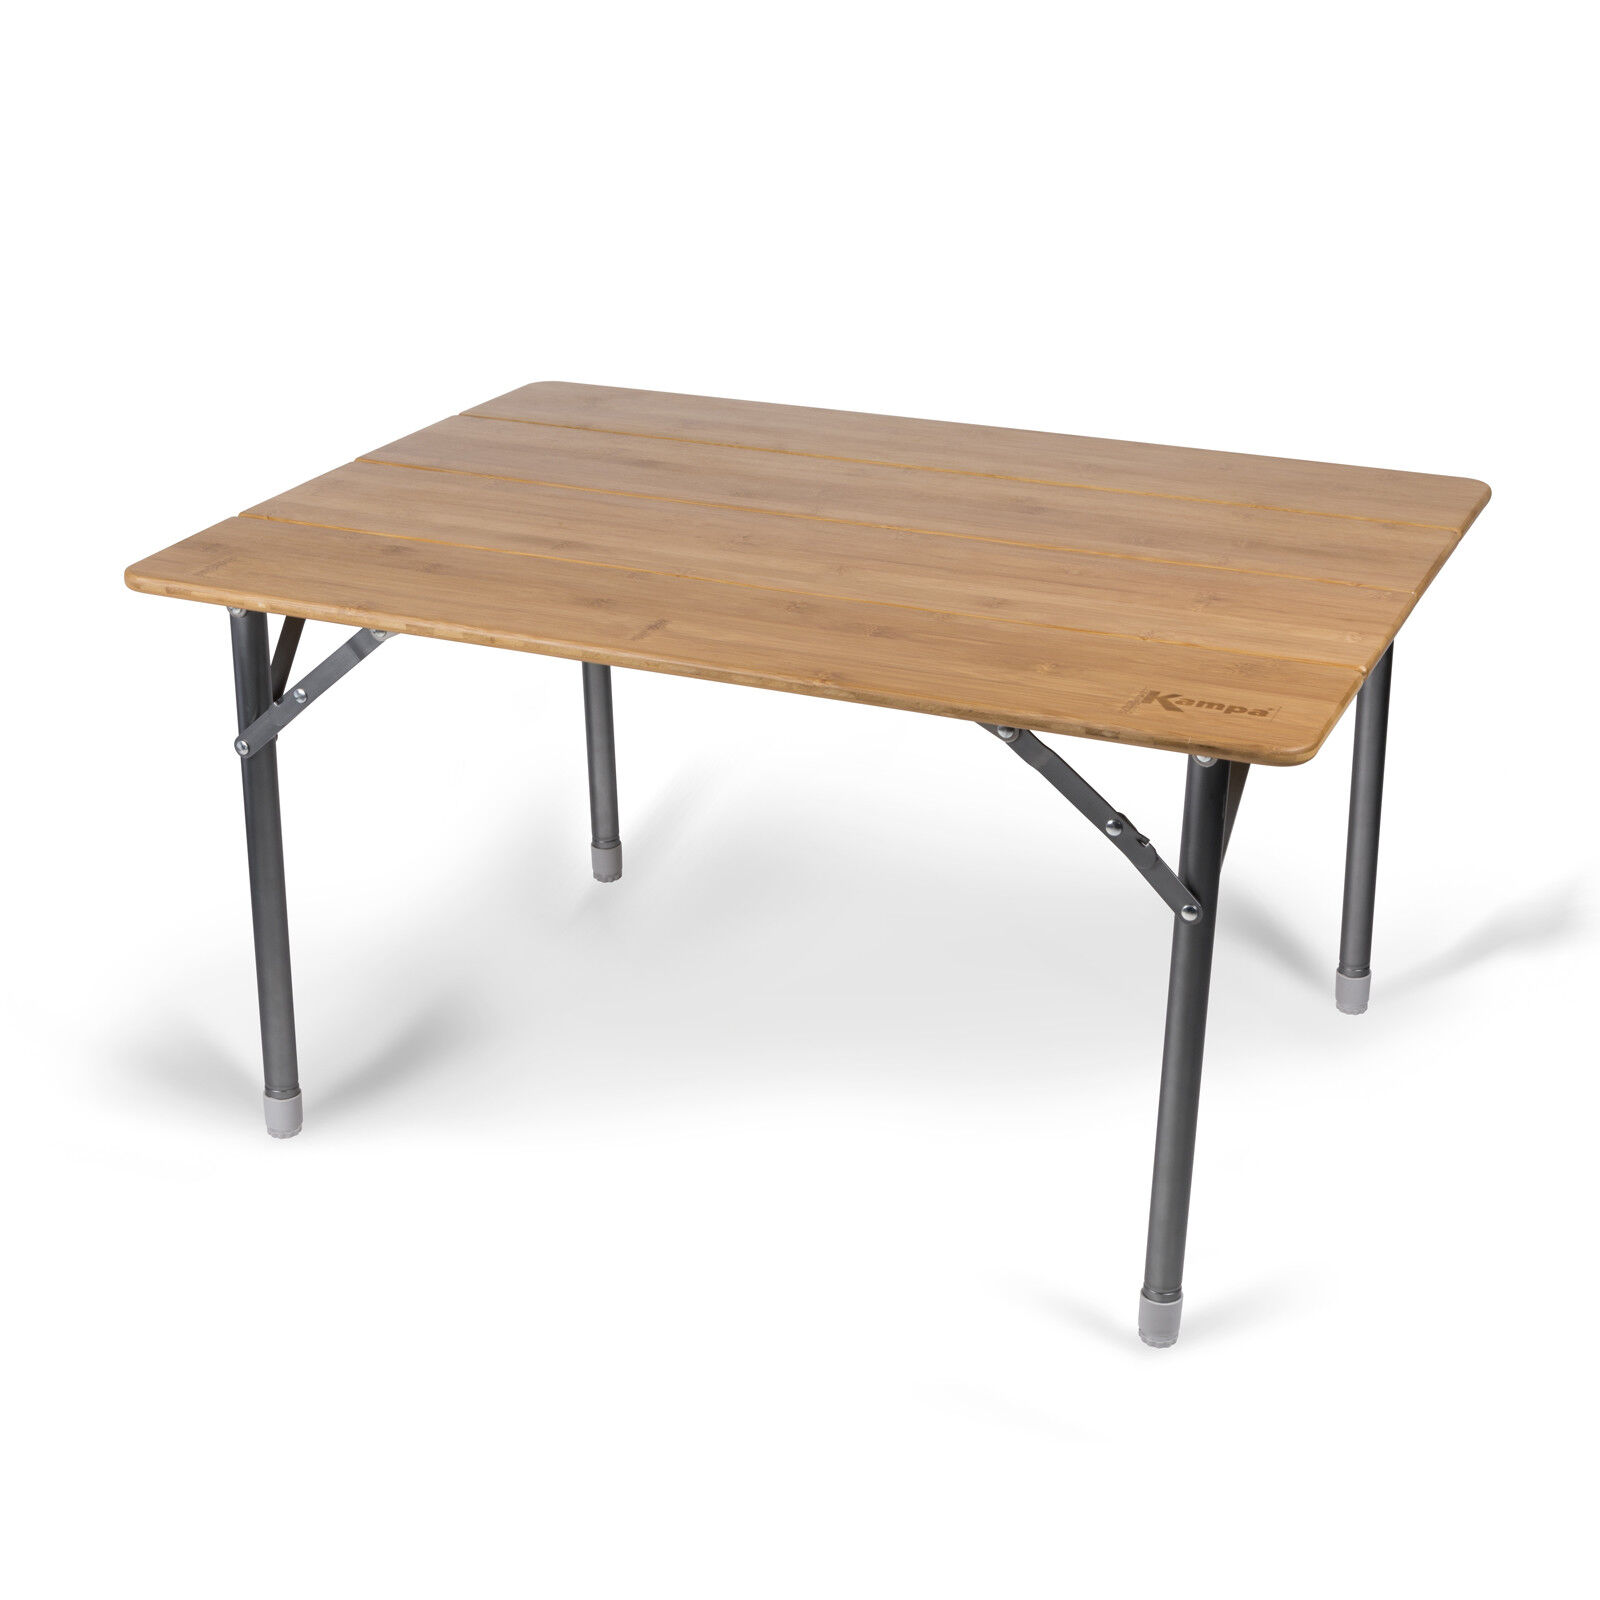 Campingtisch Gartentisch Tisch Klapptisch Falttisch Tisch Gartentisch Bierzelttisch Bambus Tisch 9d074f